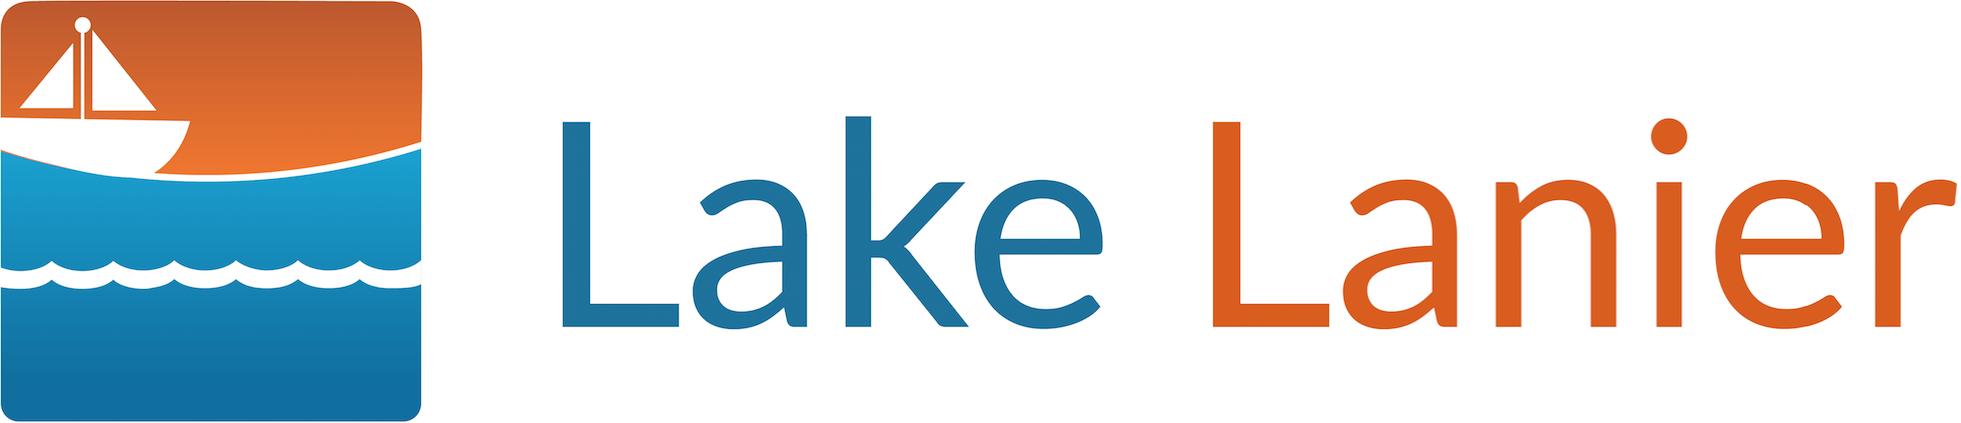 Lake Lanier Logo